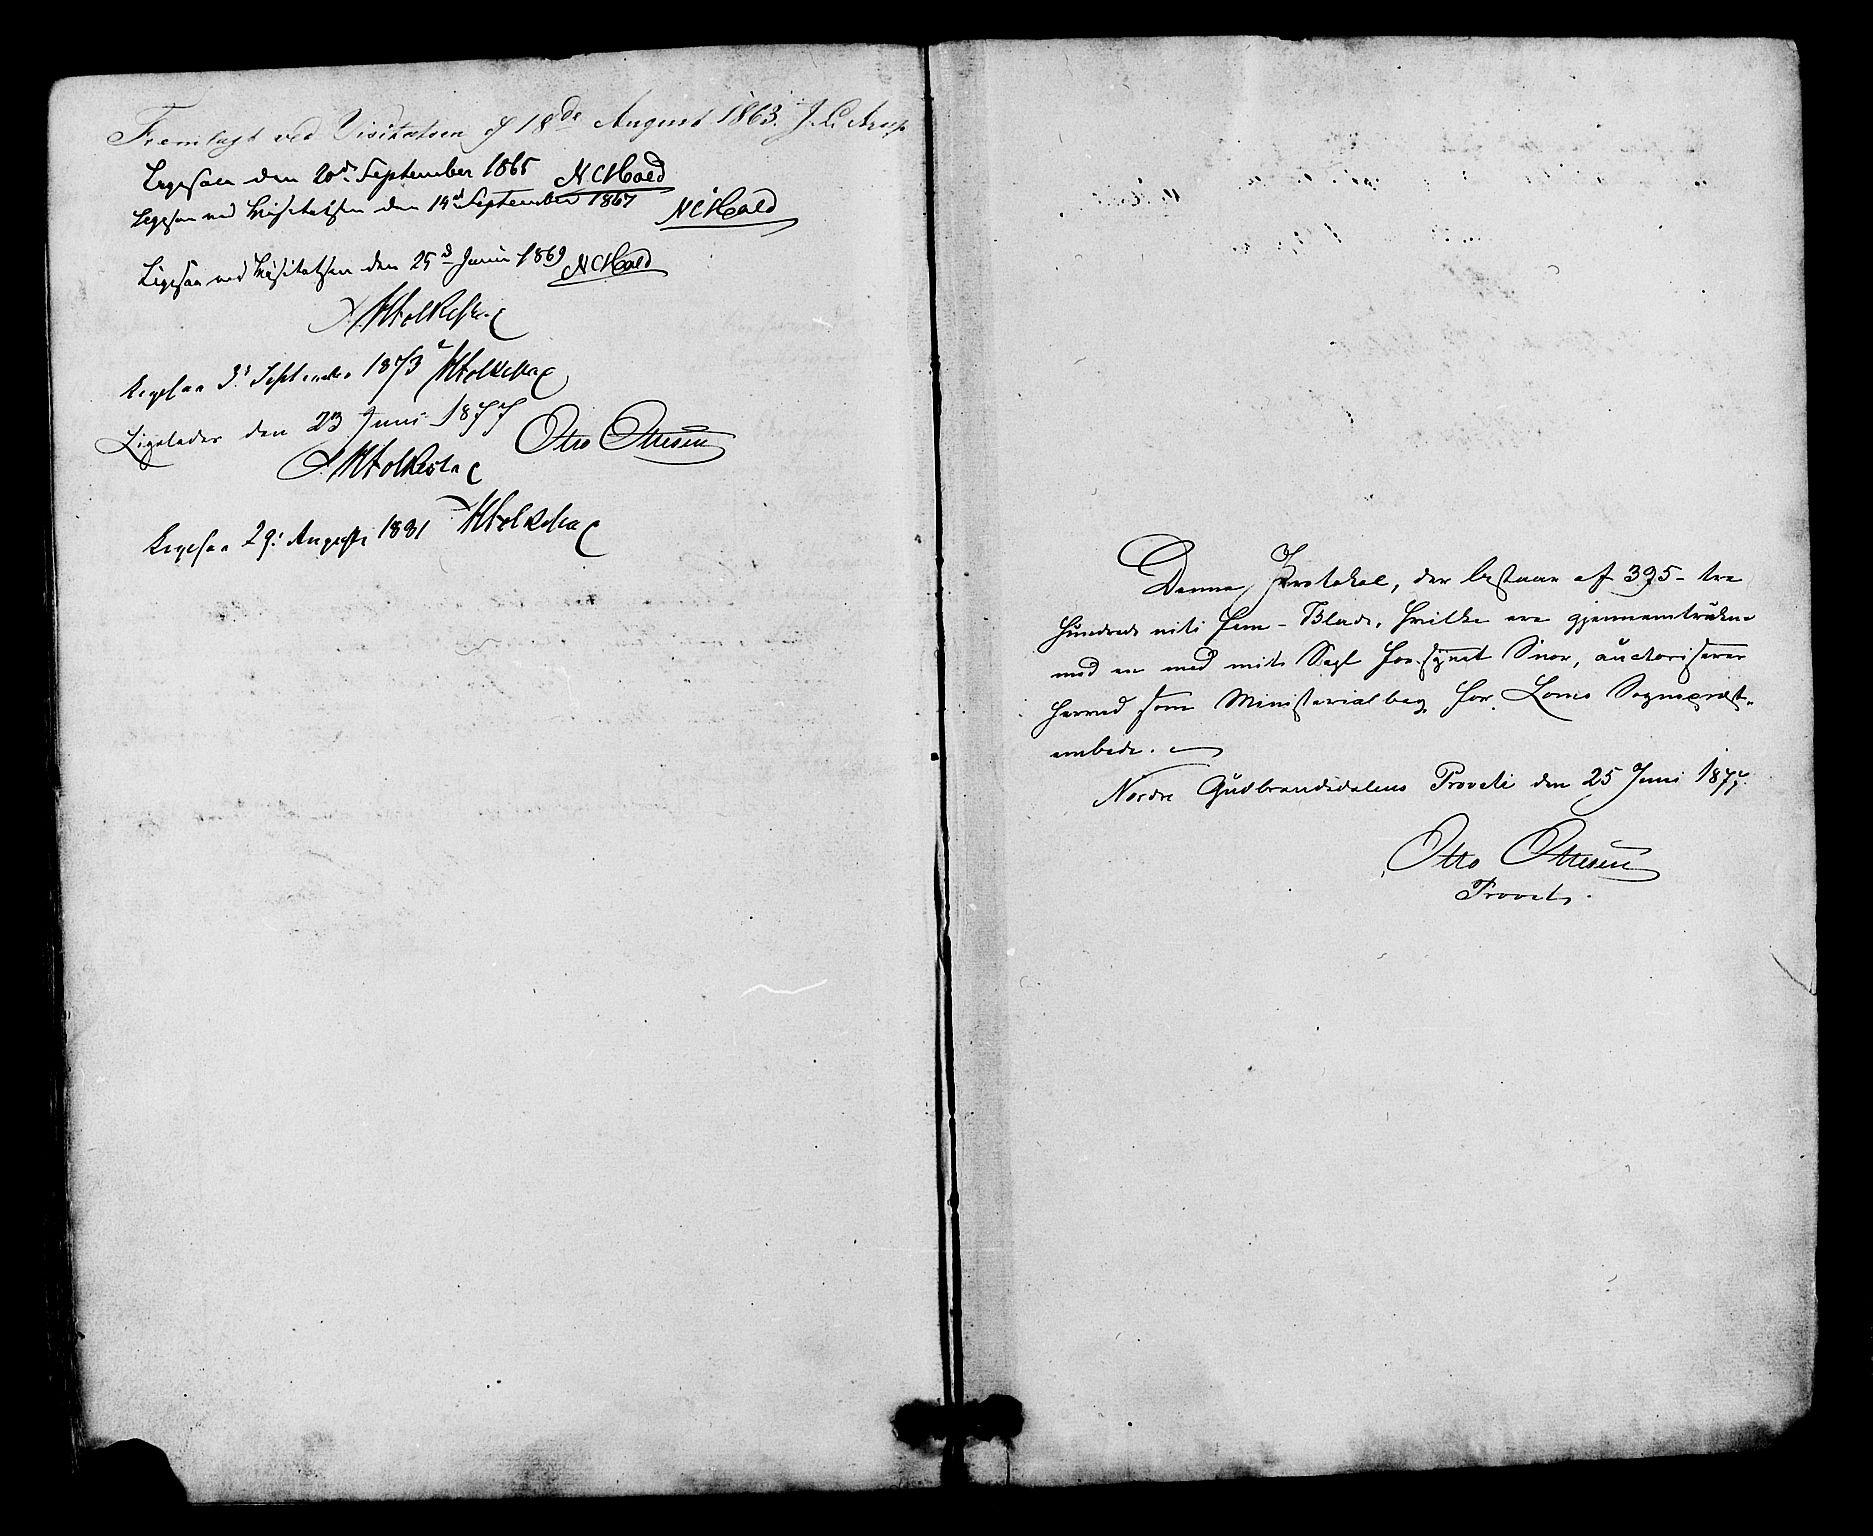 SAH, Lom prestekontor, K/L0007: Ministerialbok nr. 7, 1863-1884